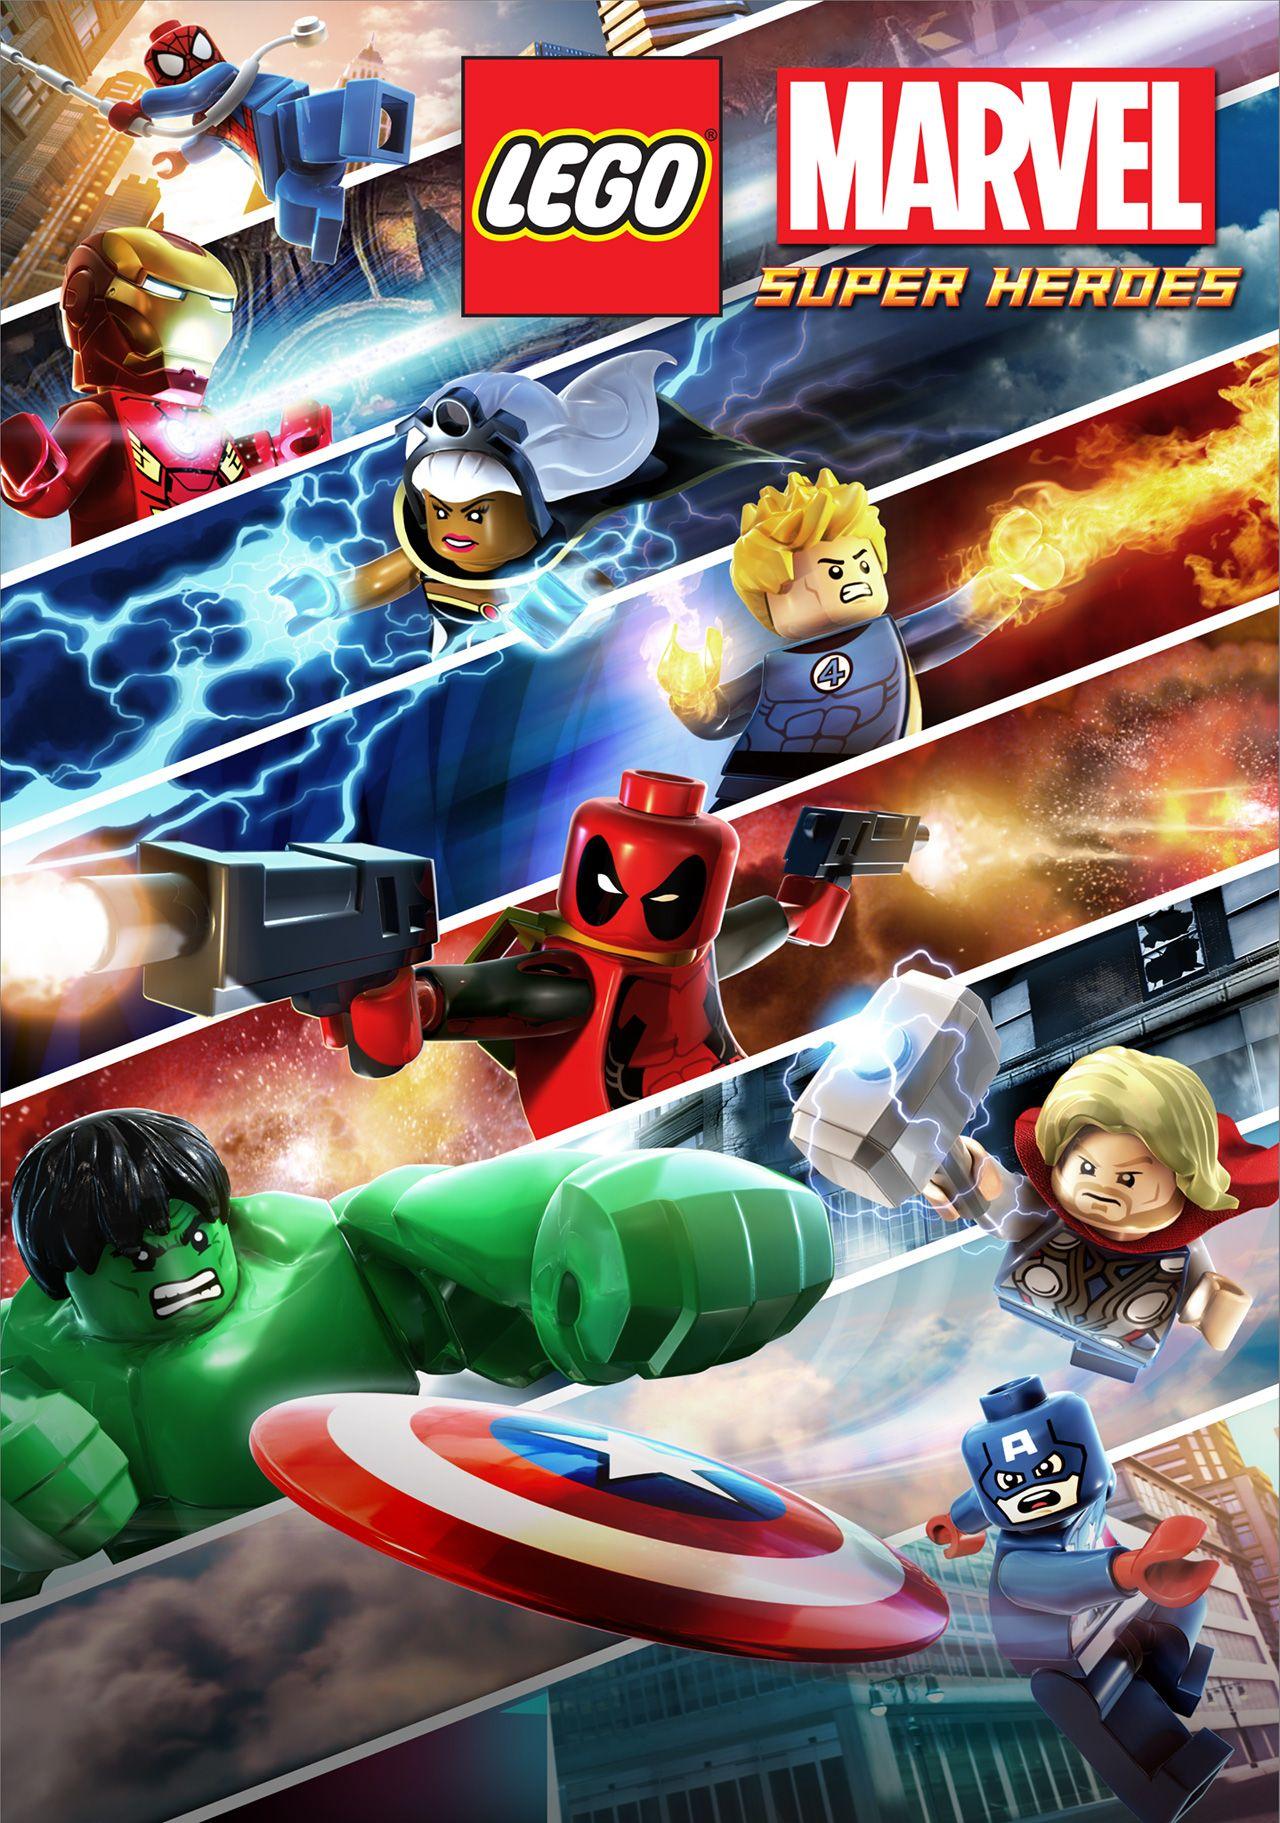 Lego Marvel Super Heroes Avengers Reassembled 2015 , HD Wallpaper & Backgrounds